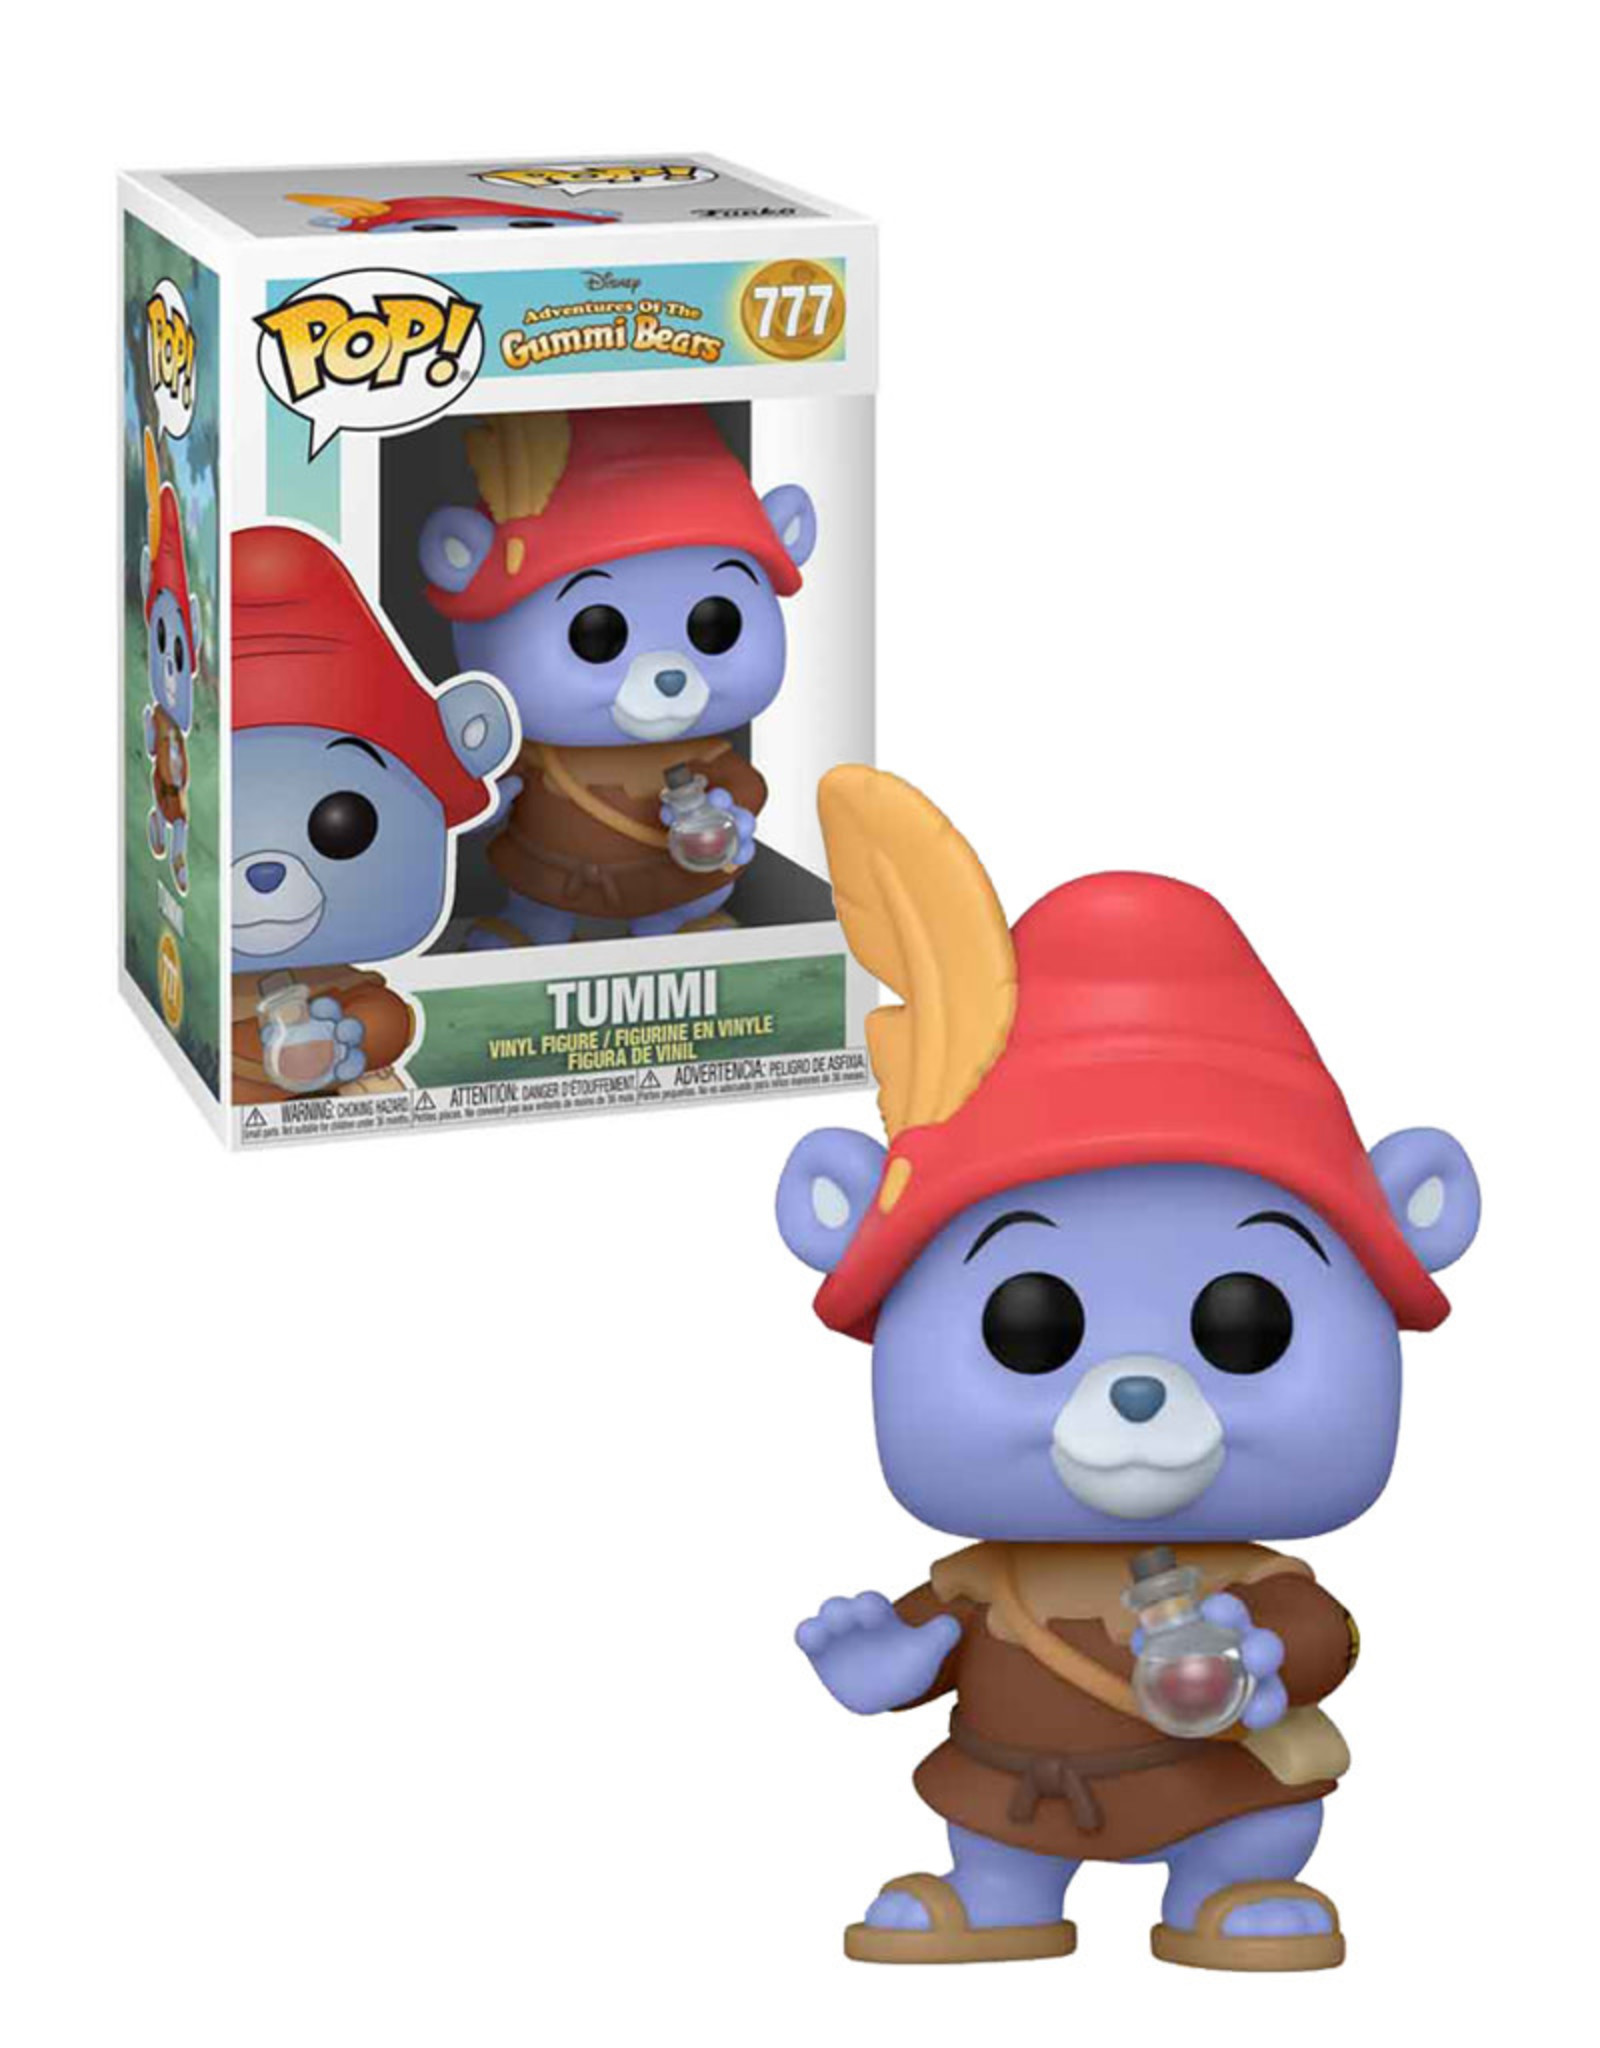 Adventures of the Gummi Bears 777 ( Funko Pop ) Tummi